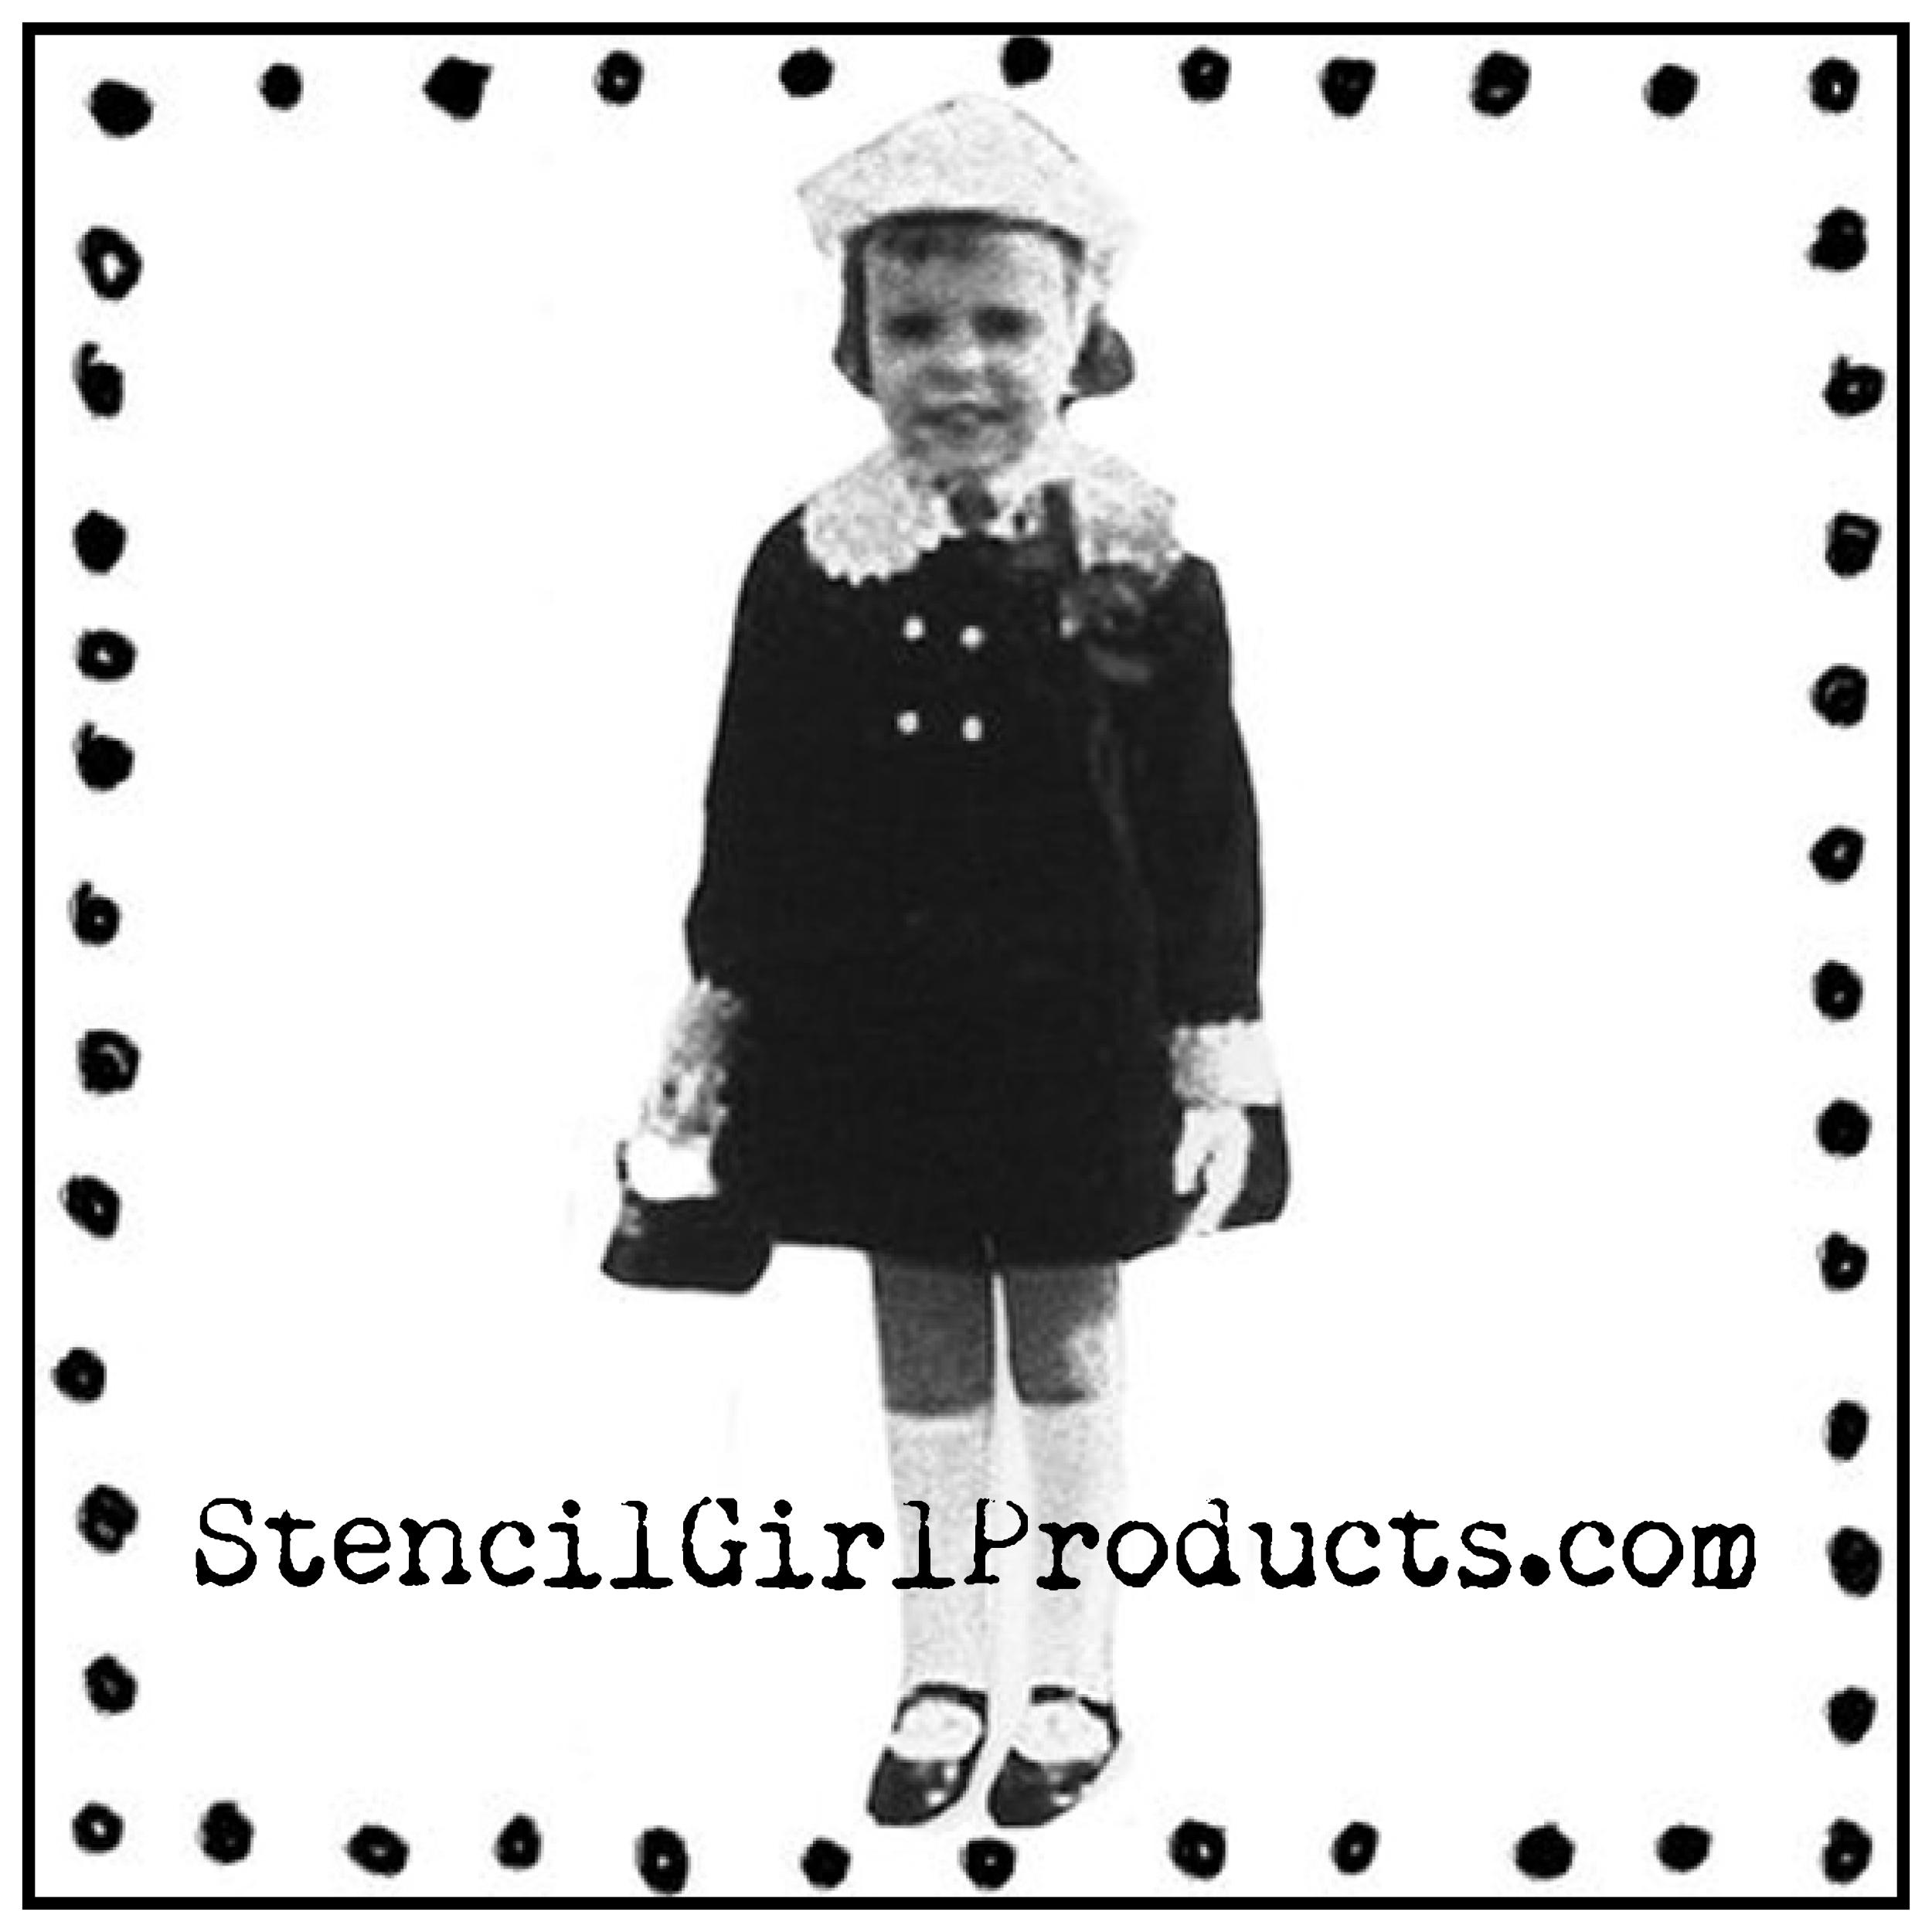 Stencil Girl Logo